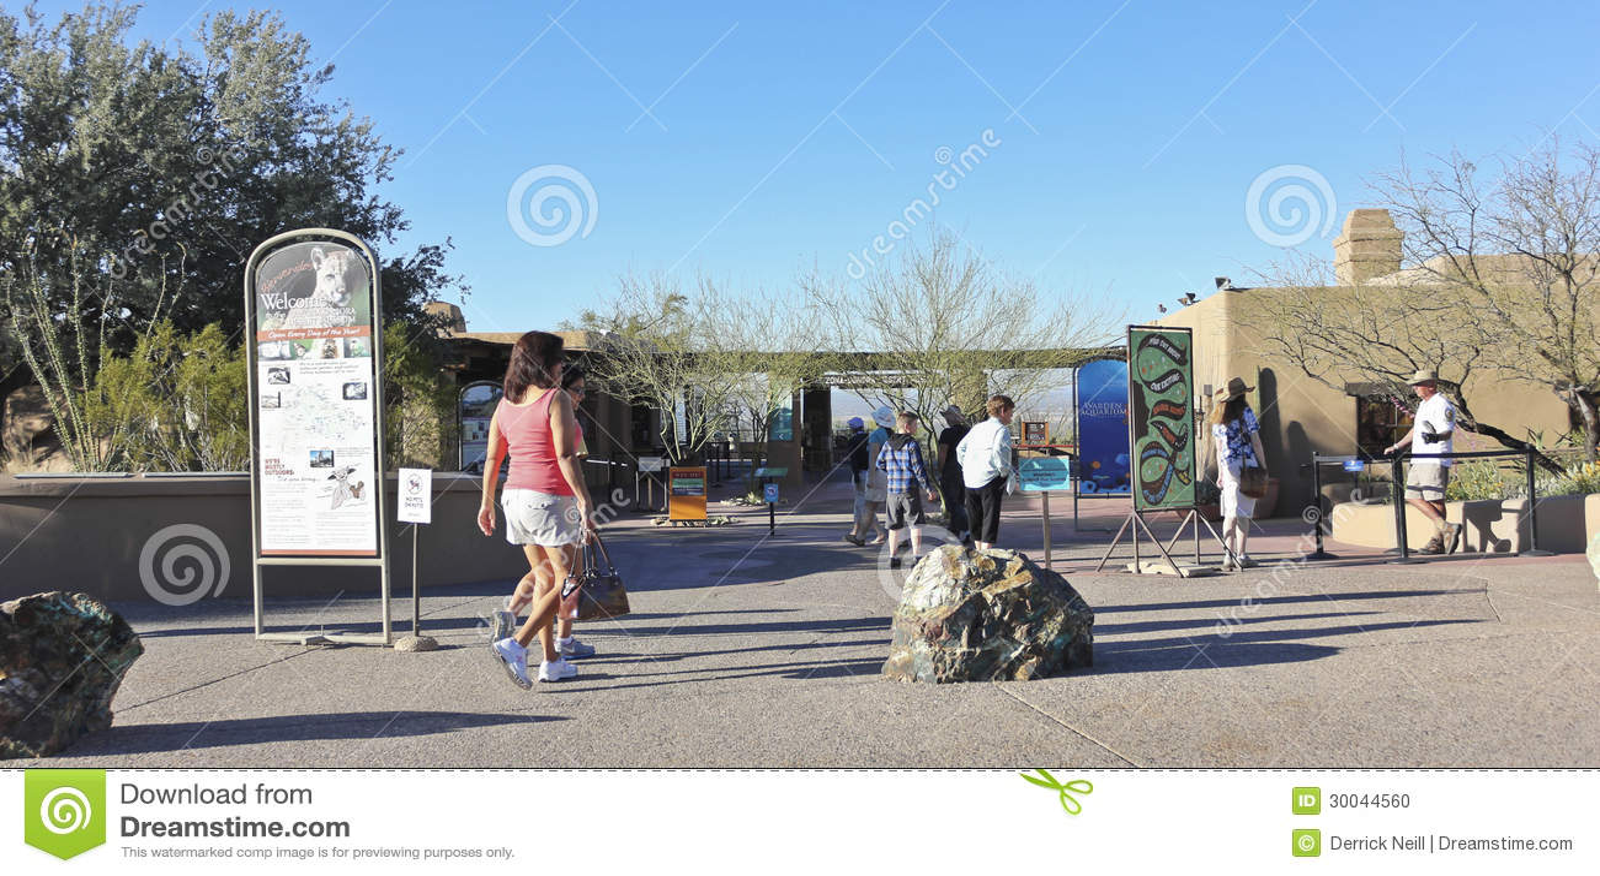 An Arizona Sonora Desert Museum Entrance, Tucson, Arizona